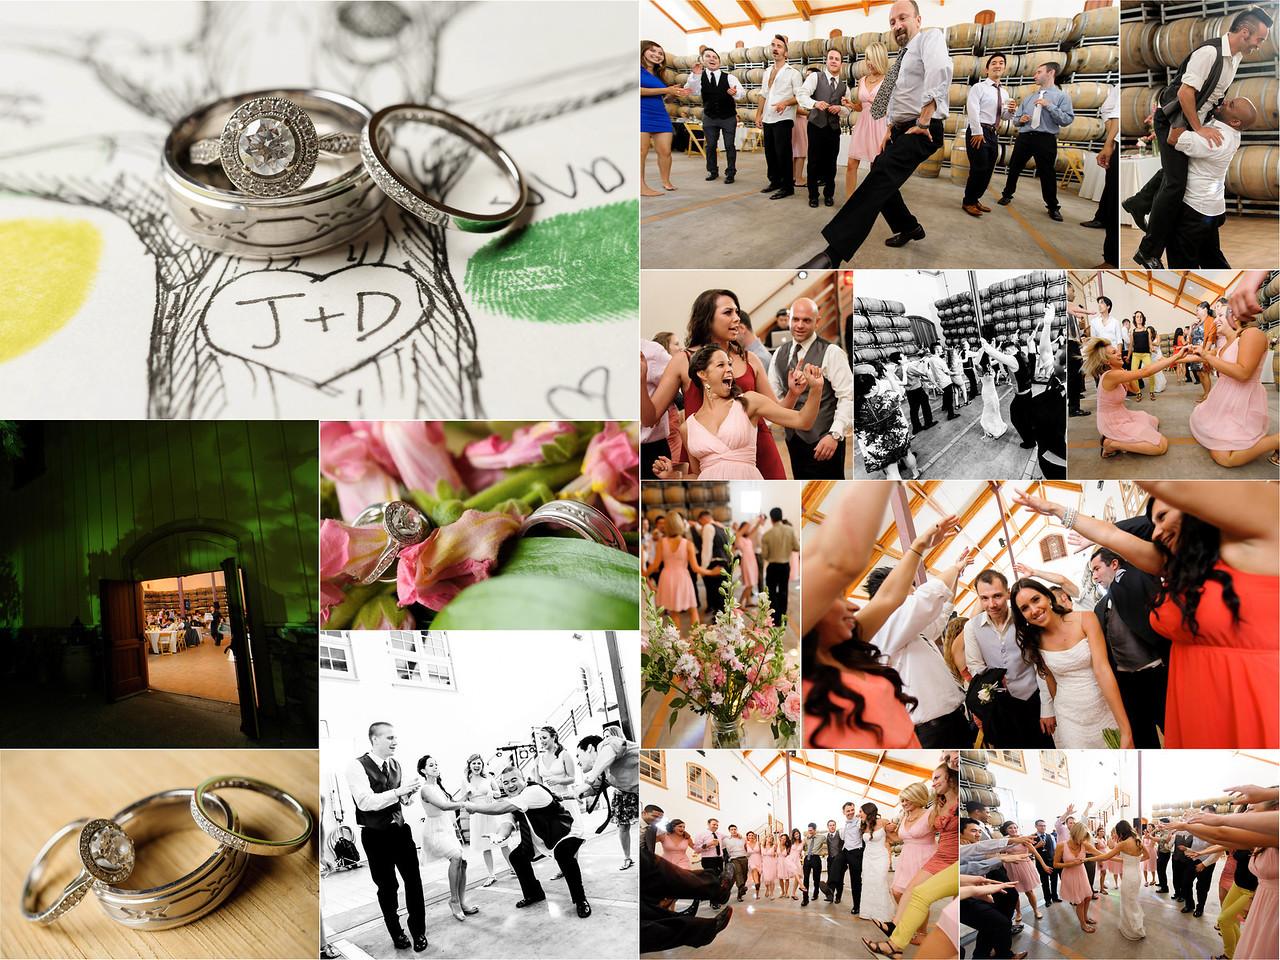 Jenny_and_Dimitriy_Wedding_Photography_4x6_Photo_Board_08